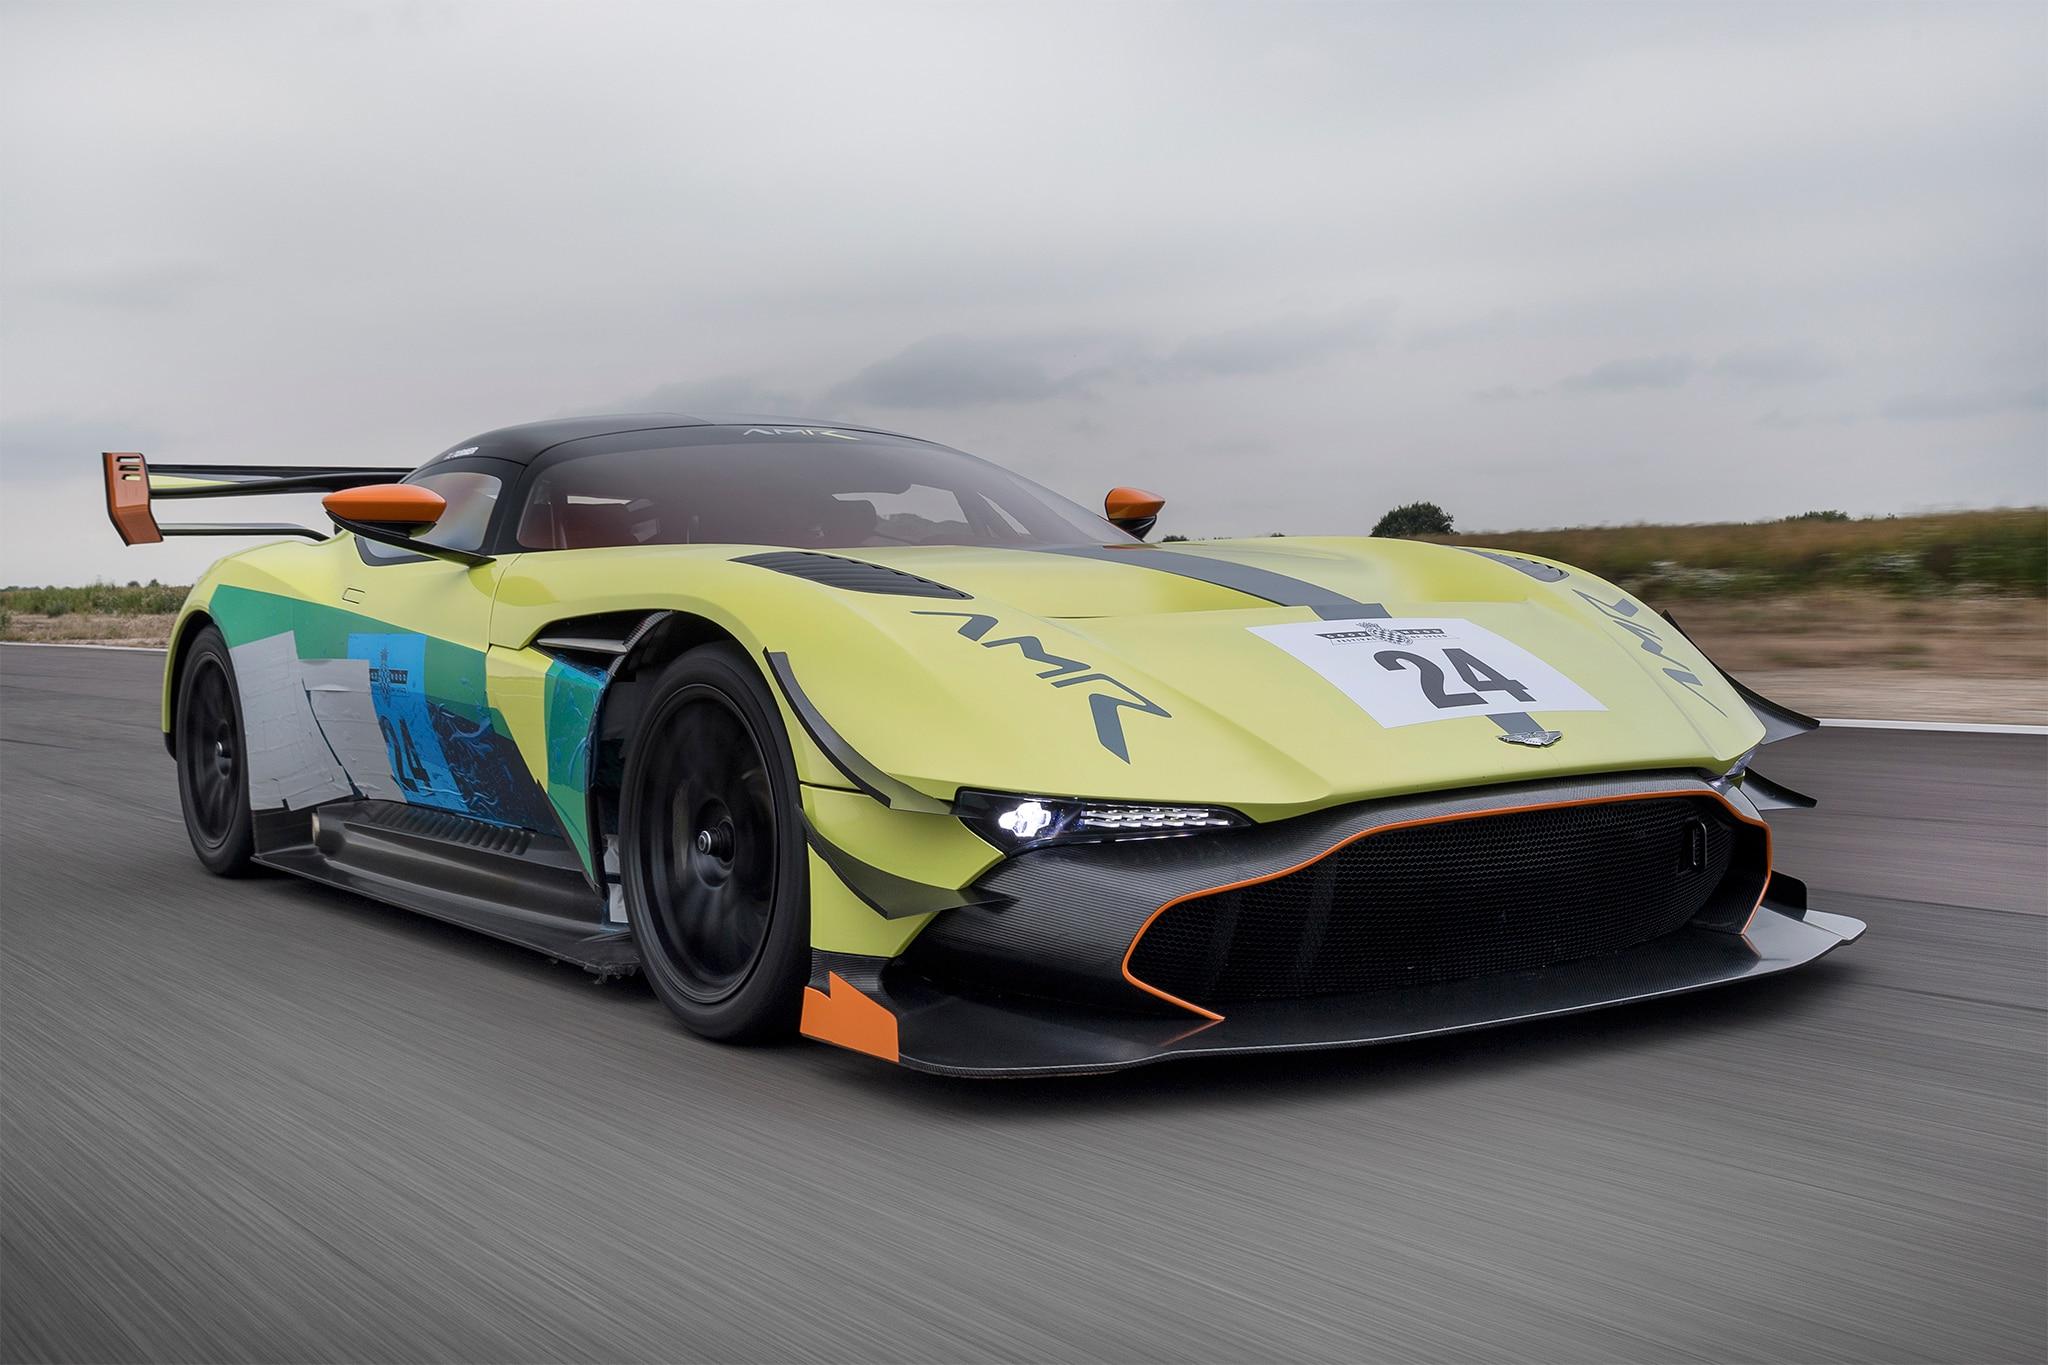 Aston Martin Racing Vulcan Pro Front Three Quarter In Motion 7